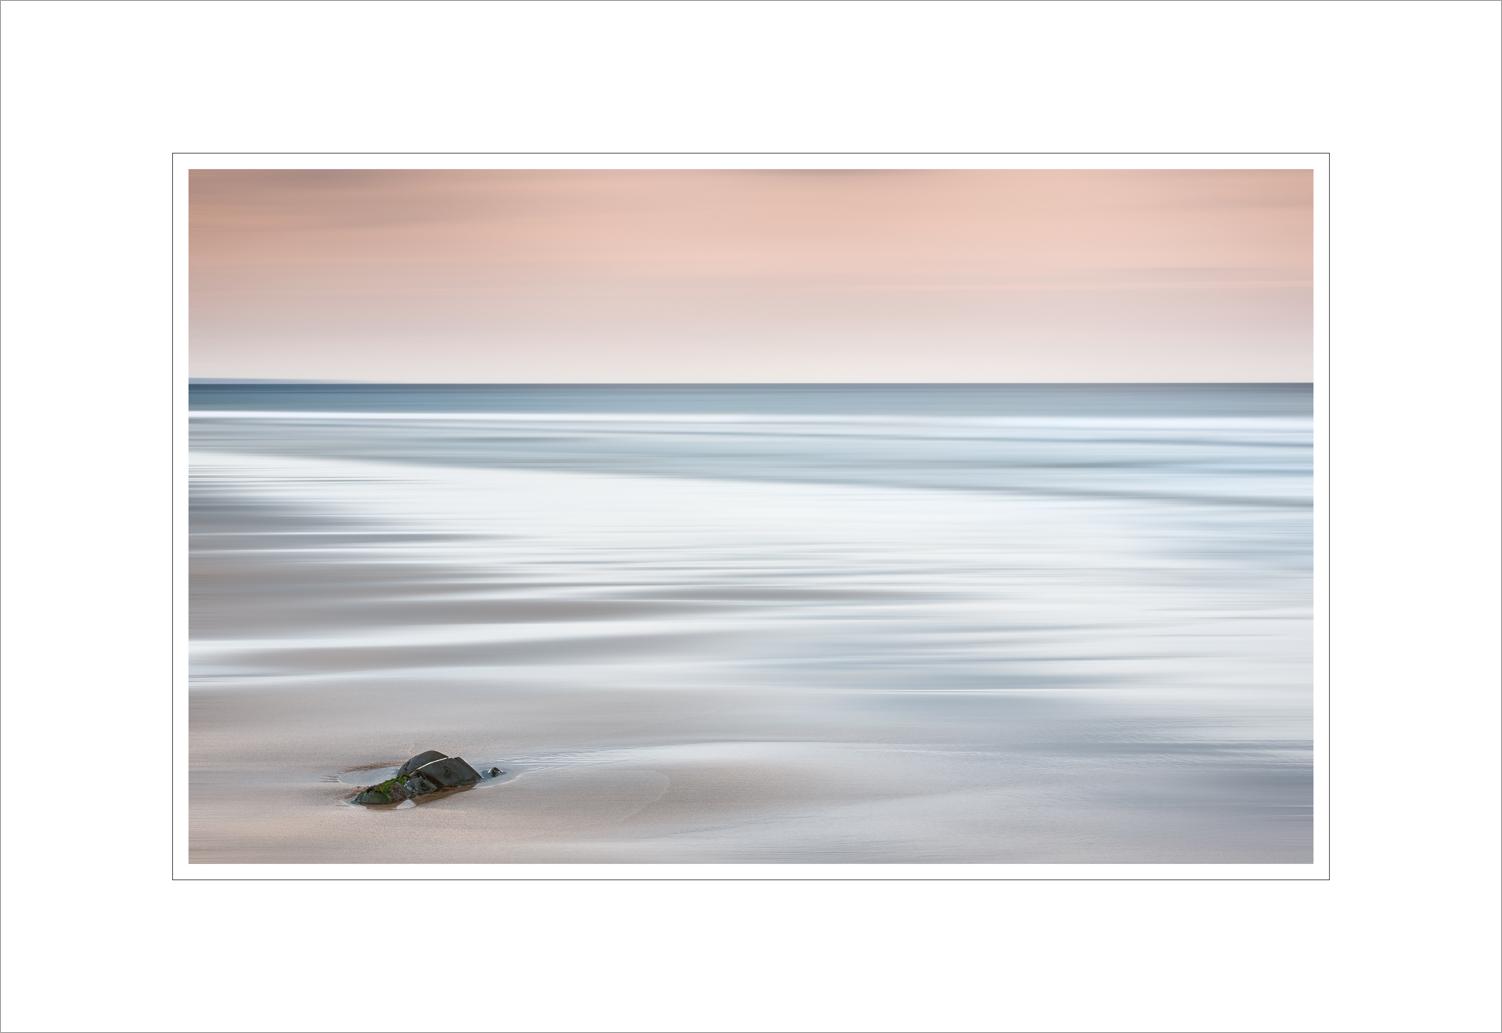 014 Shoreline Shimmer